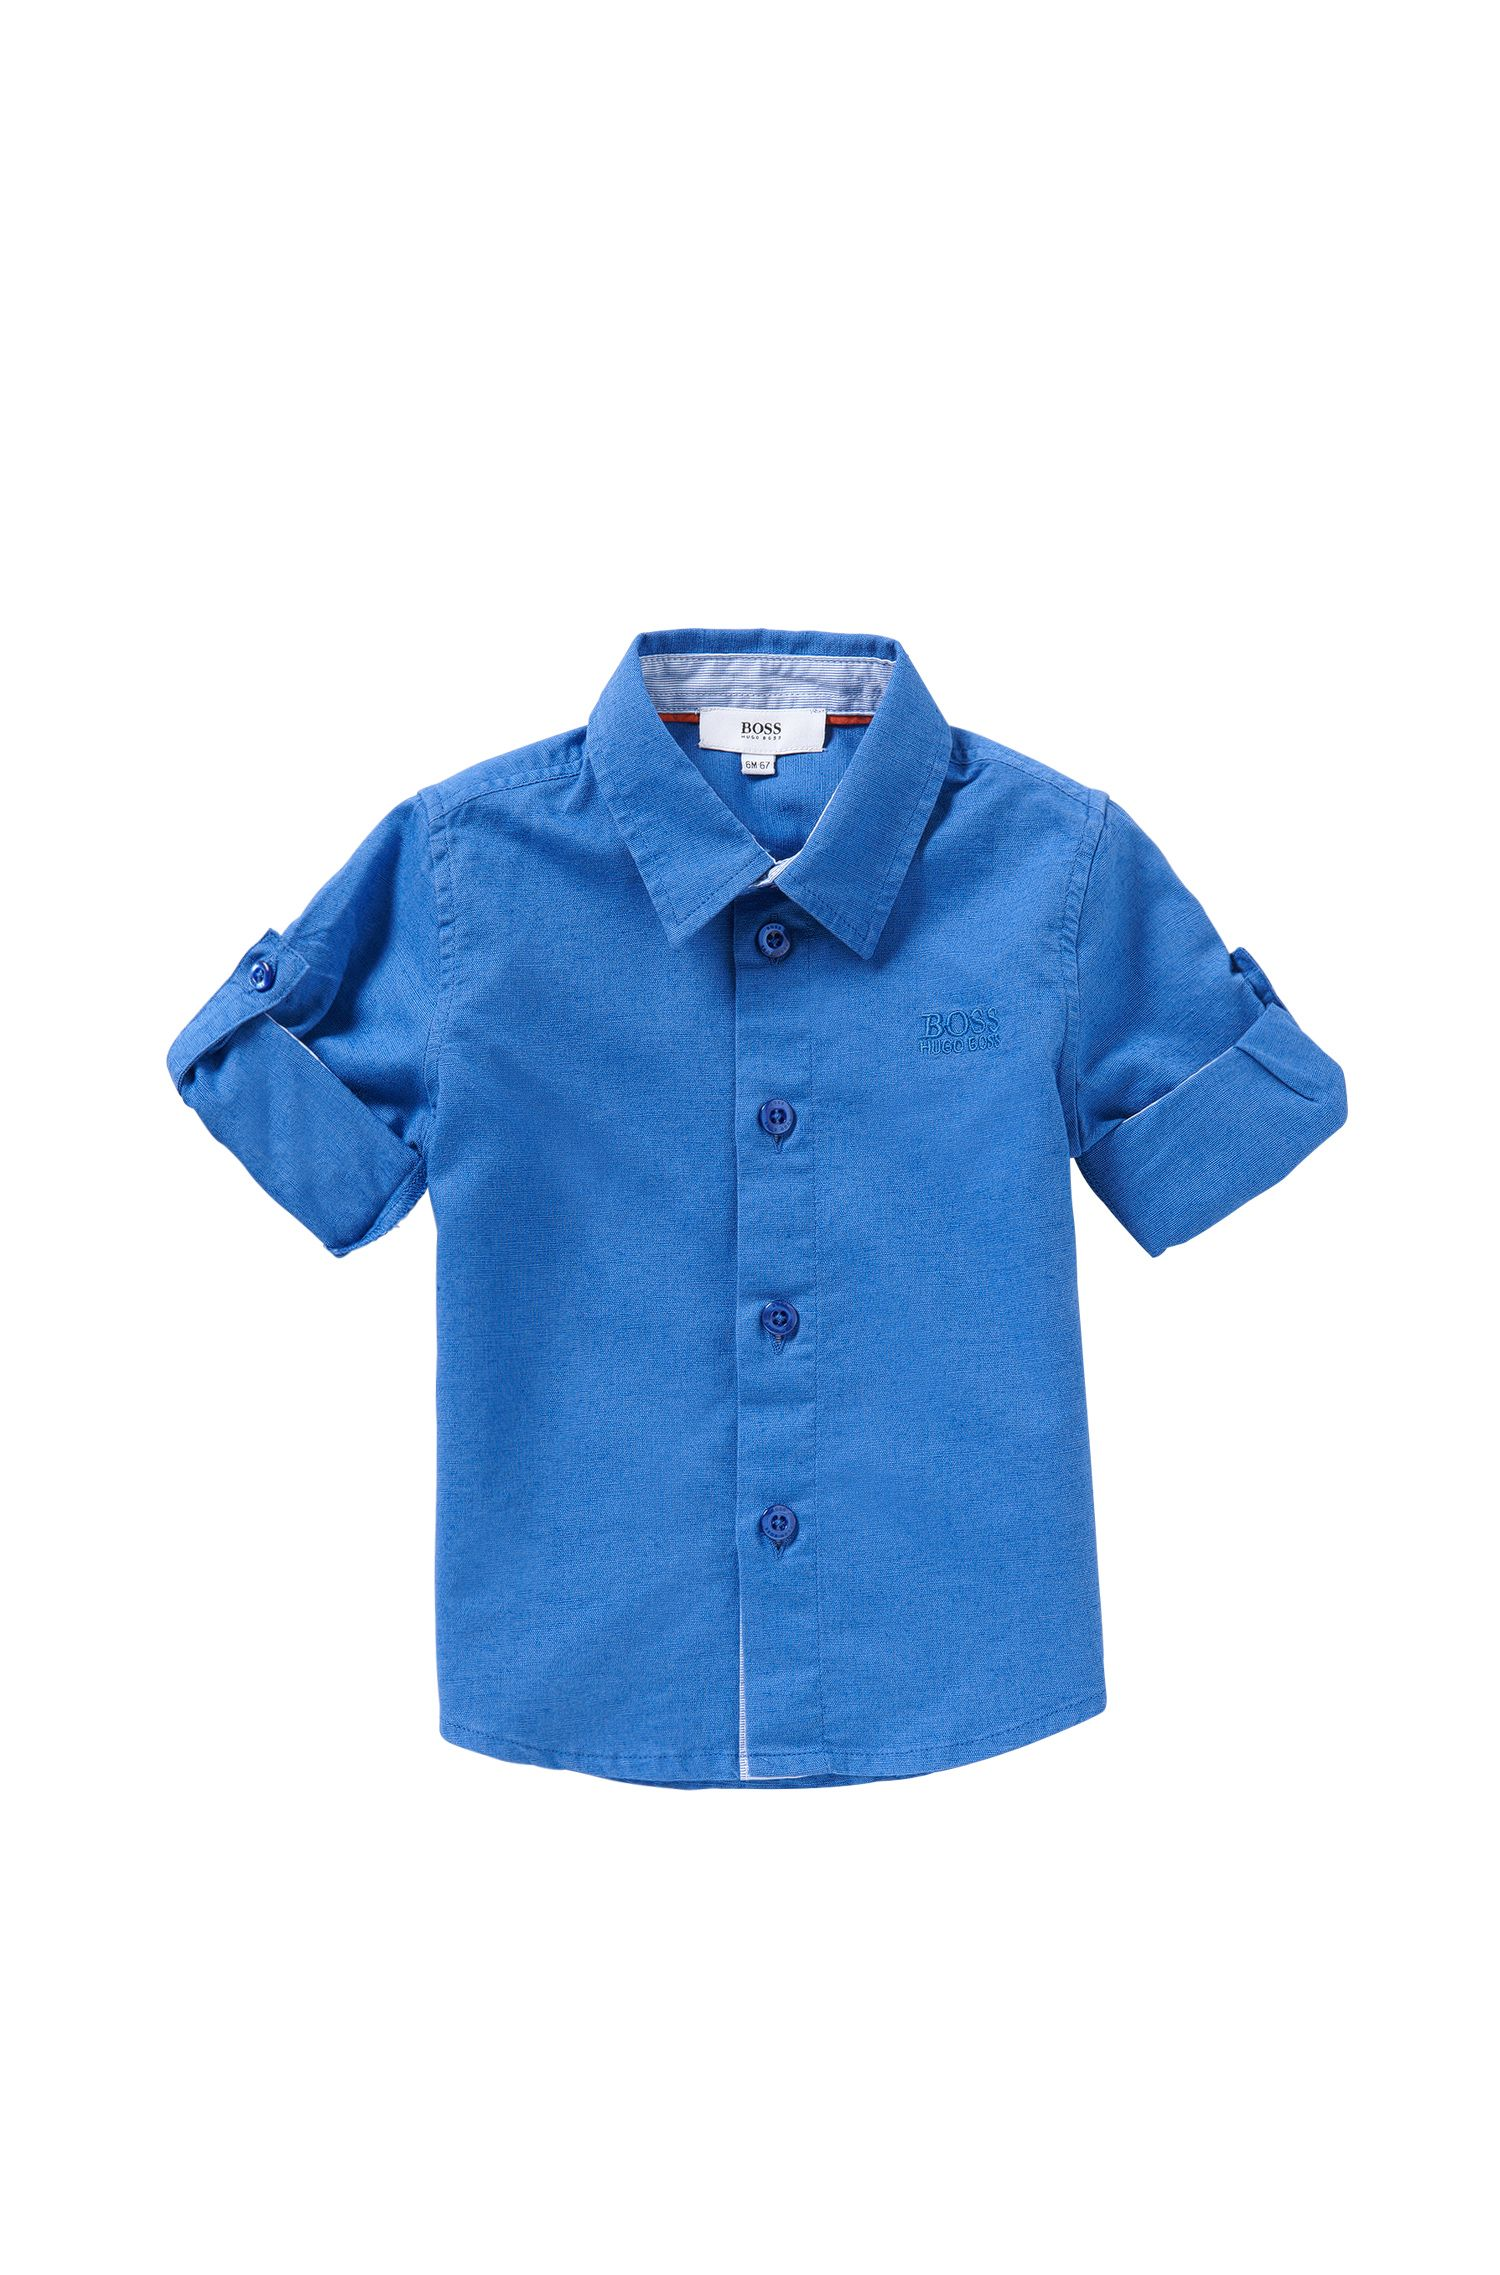 'J05465' | Toddler Cotton Button Down Shirt